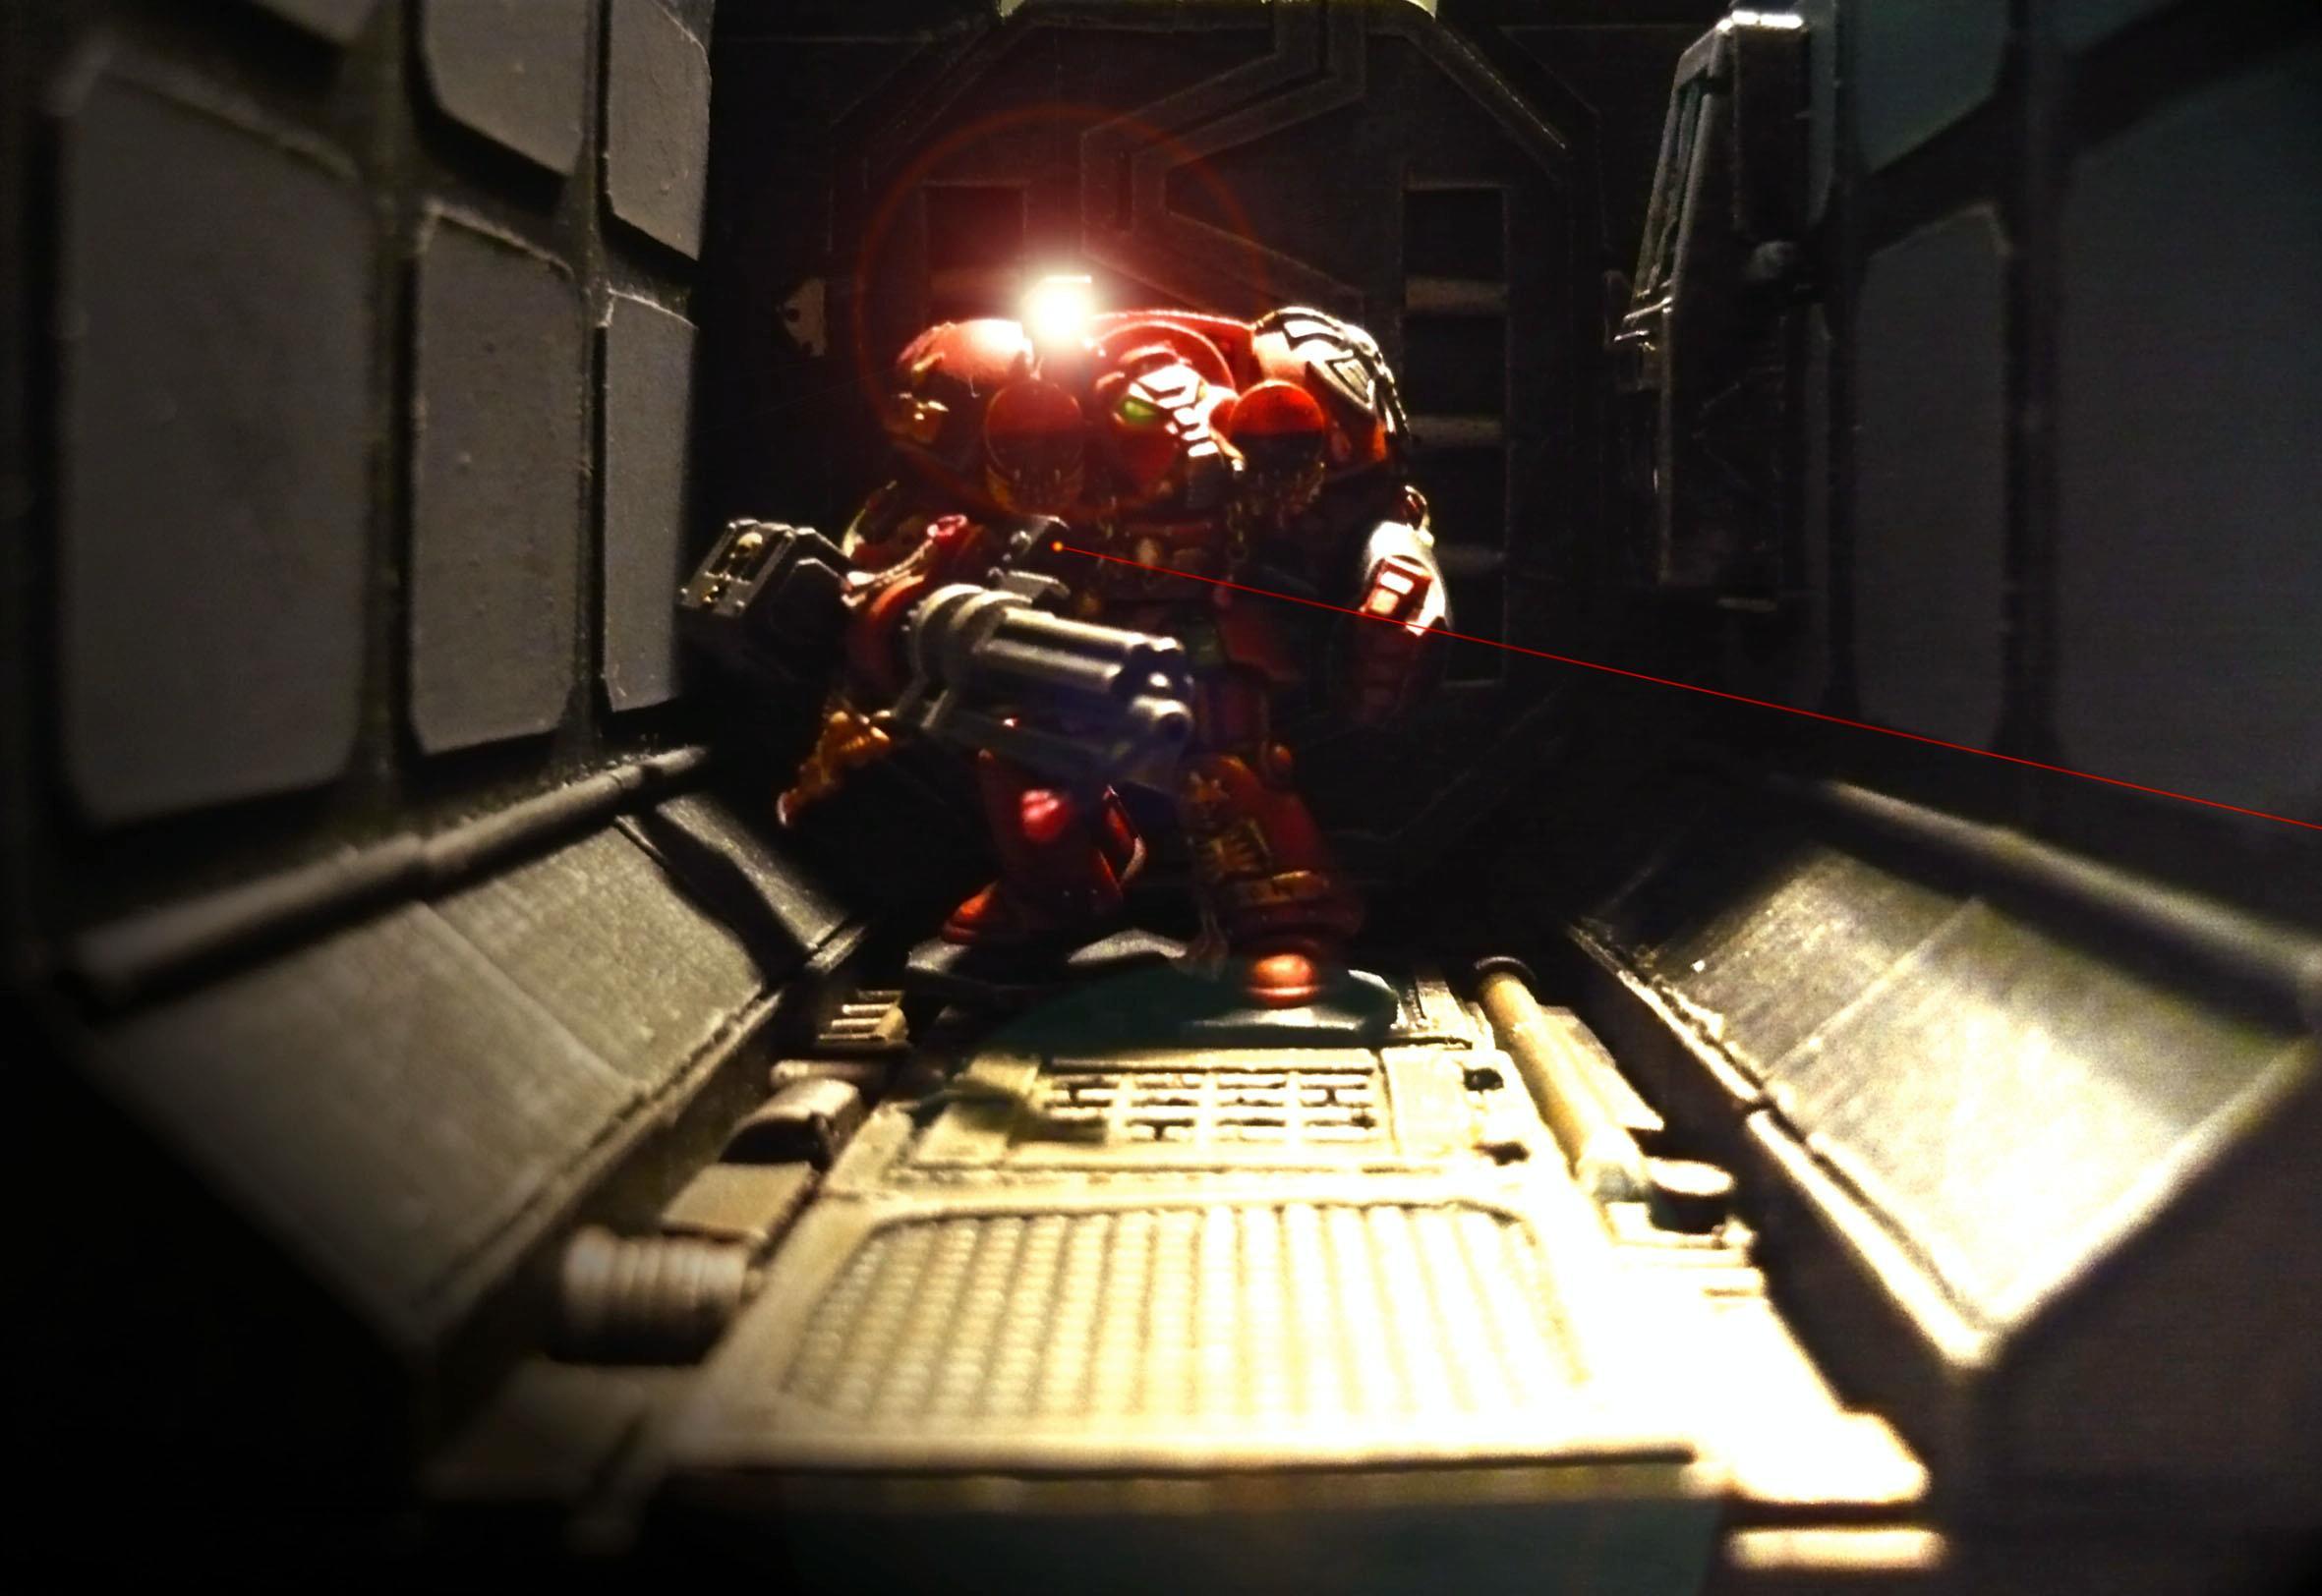 Background, Blood Angels, Hulk, LED, Photo, Red, Space, Space Hulk, Space Marines, Starship, Terminator Armor, Terrain